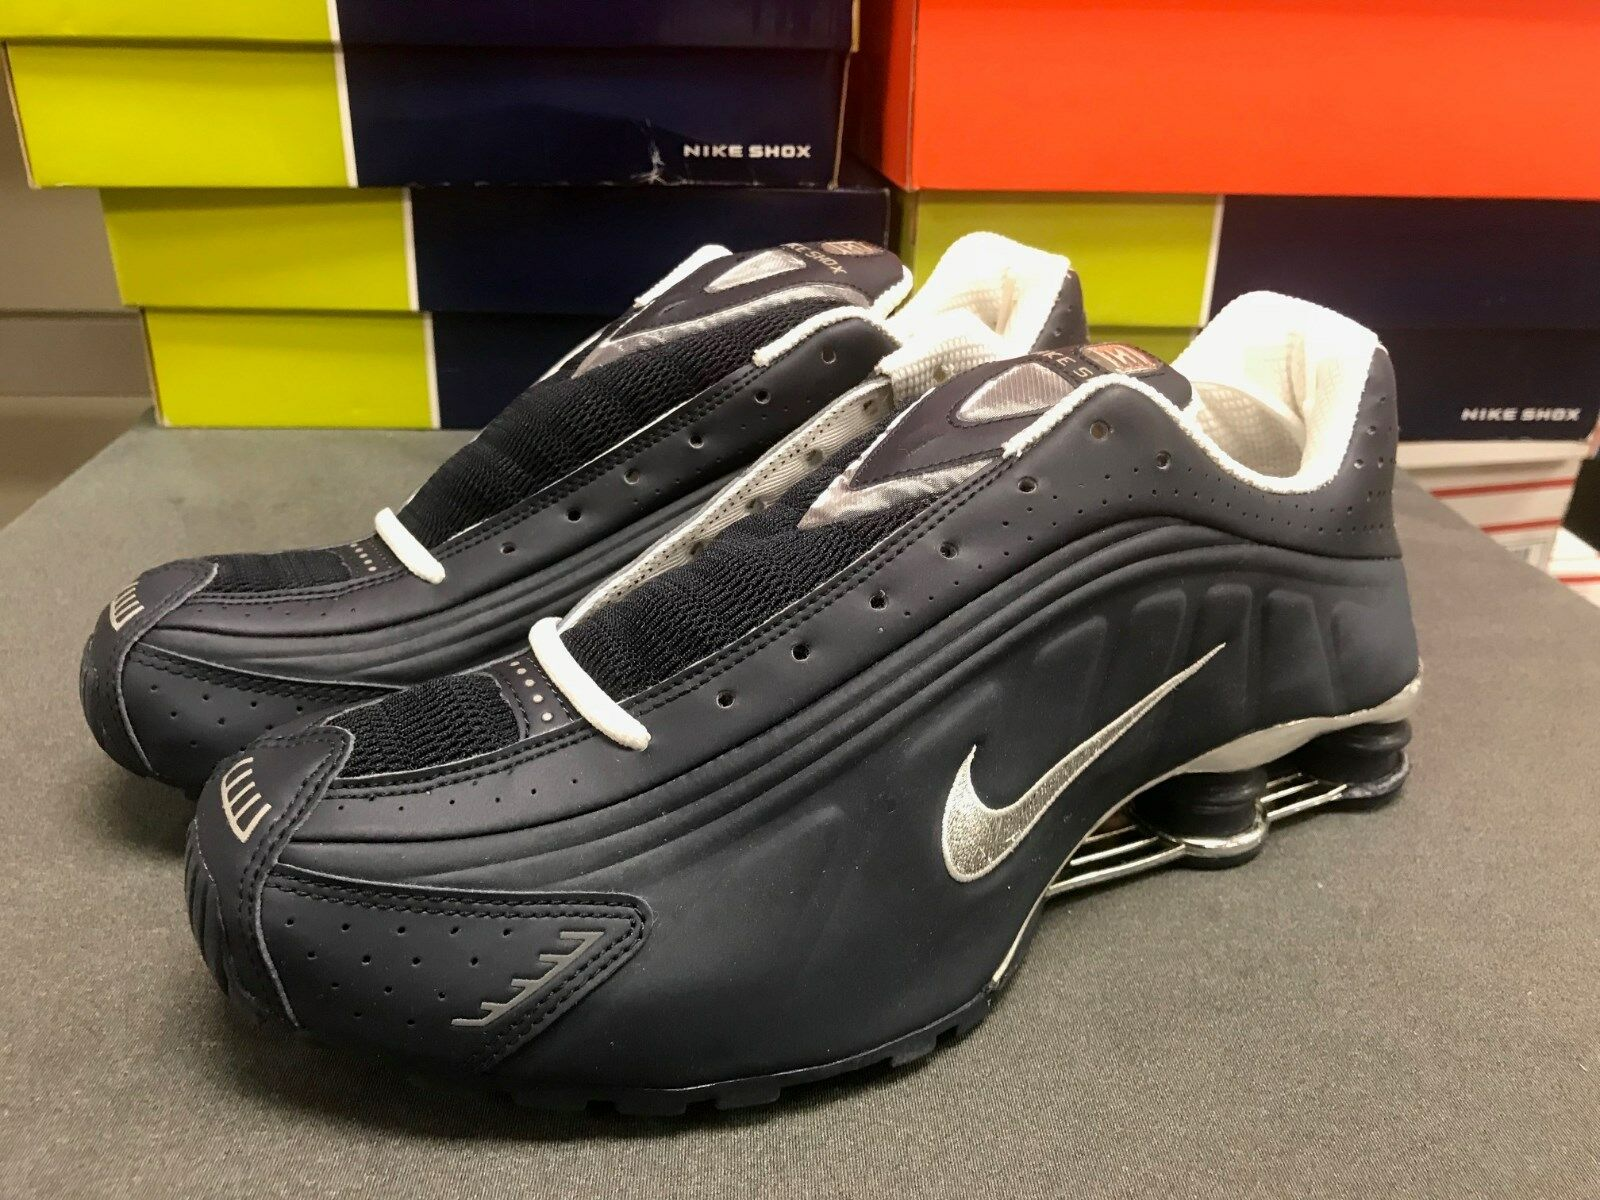 Mens Nike New, Shox R4 Premium Sneakers New, Nike Obsidian Navy Blue / Silver 302534-401 b628c0